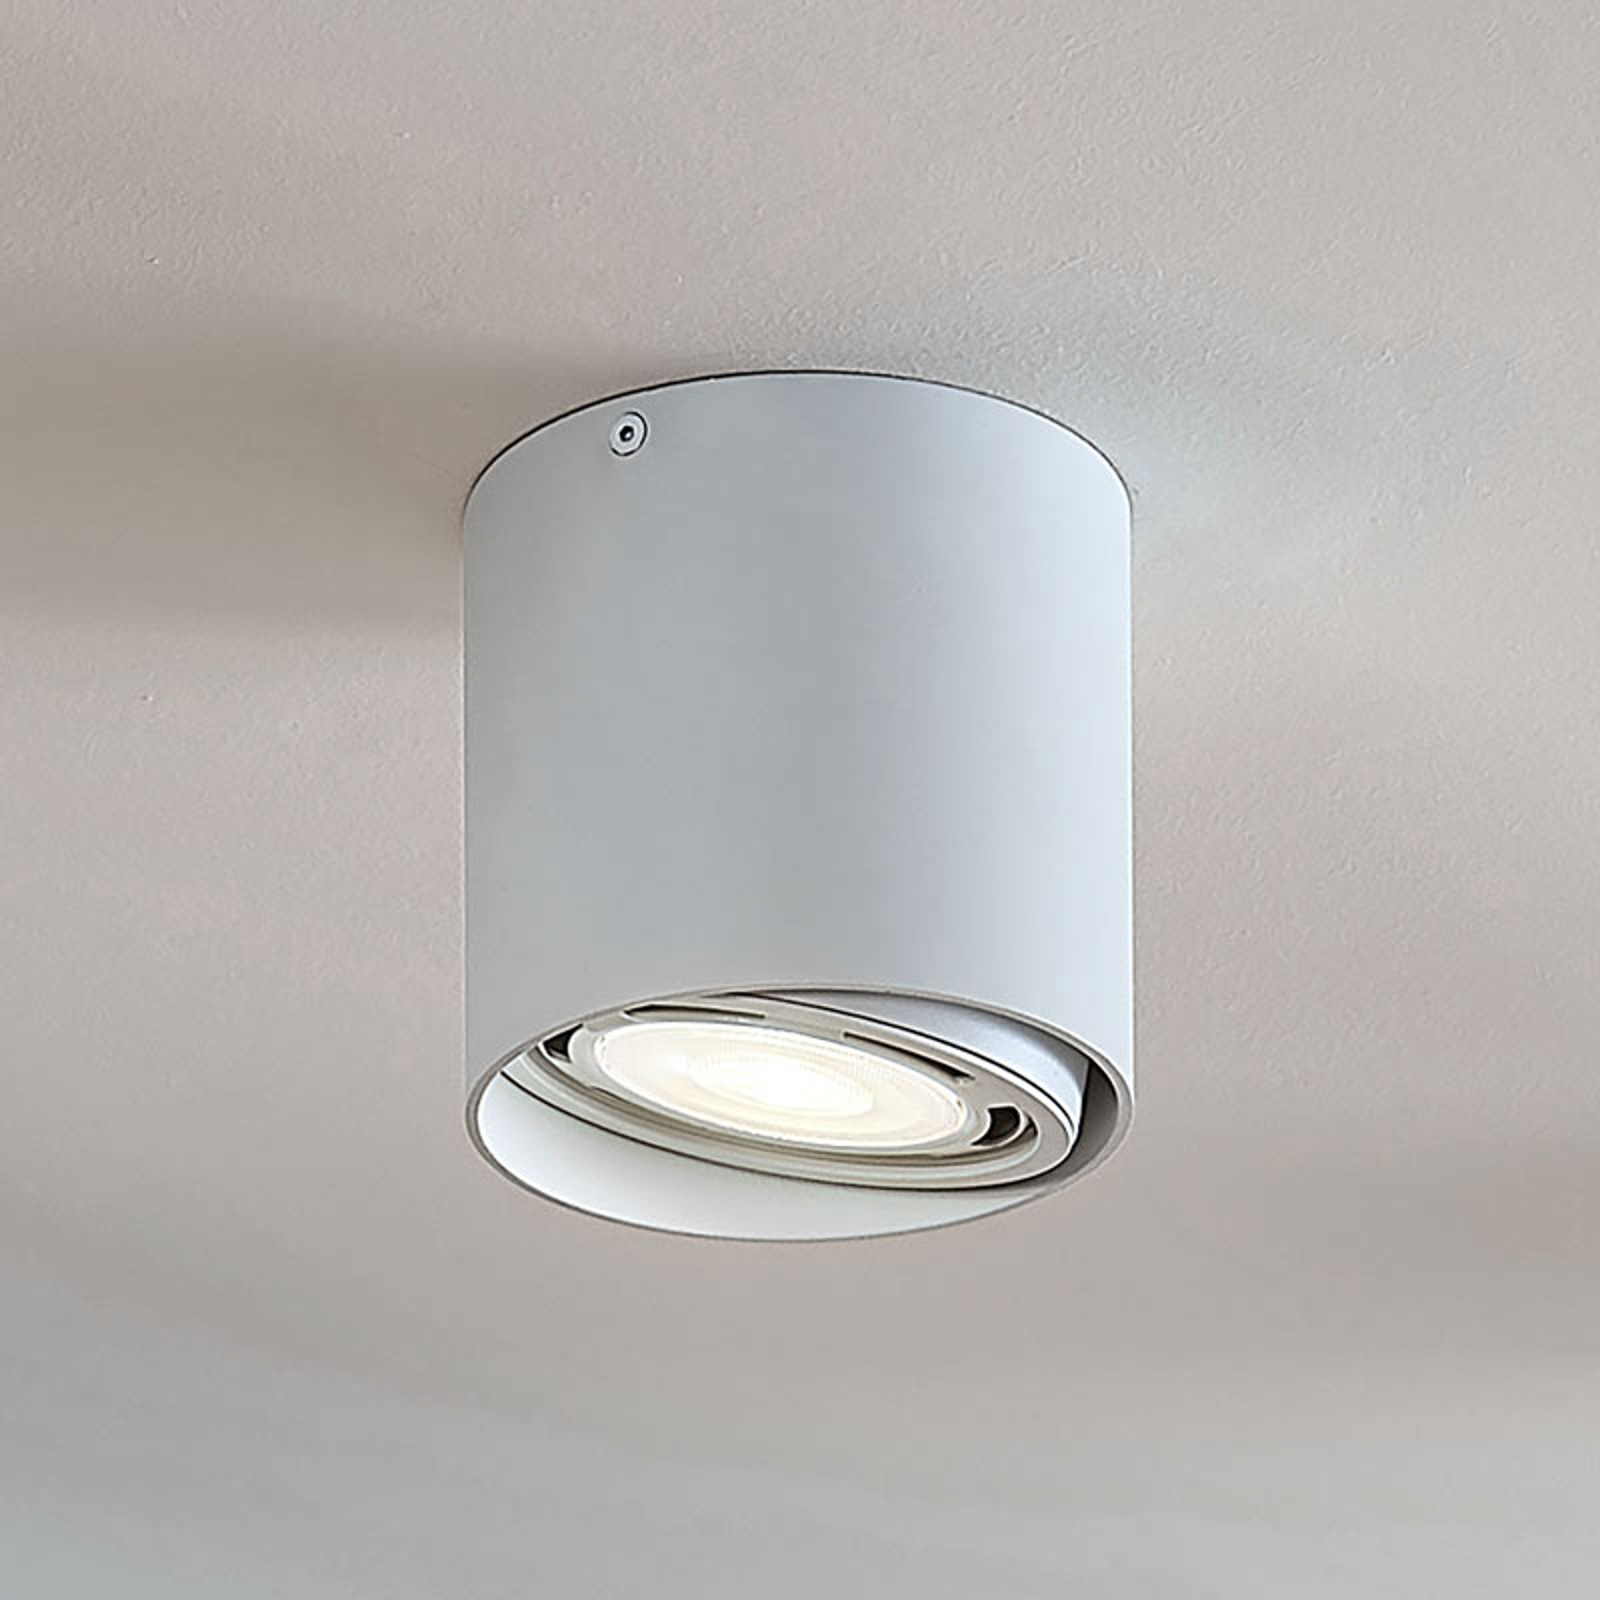 LED downlight Rosalie, dimbaar 1-lamp, rond, wit